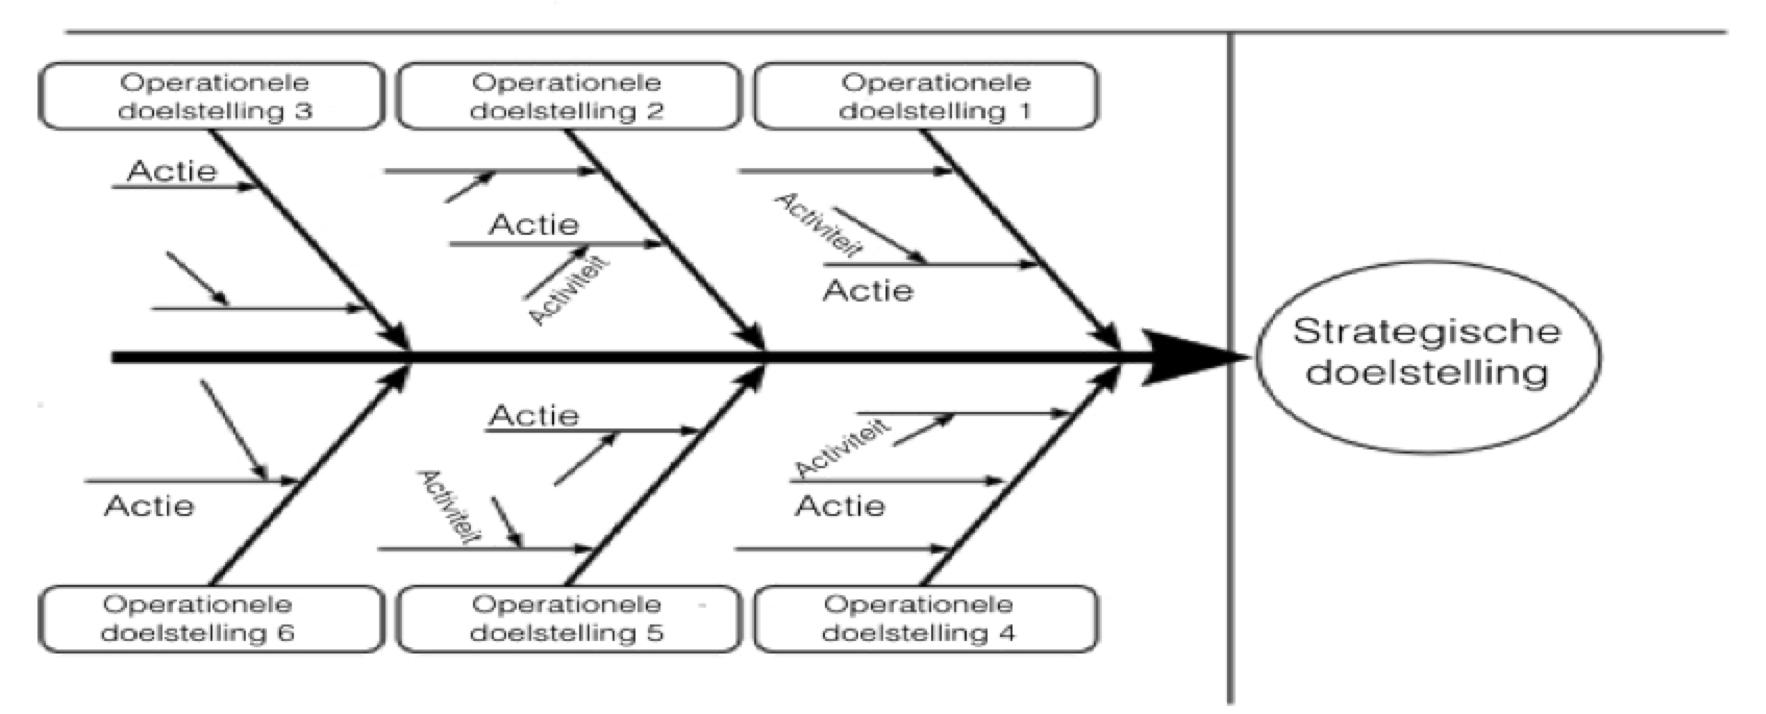 Visgraatdiagram Ishikawadiagram